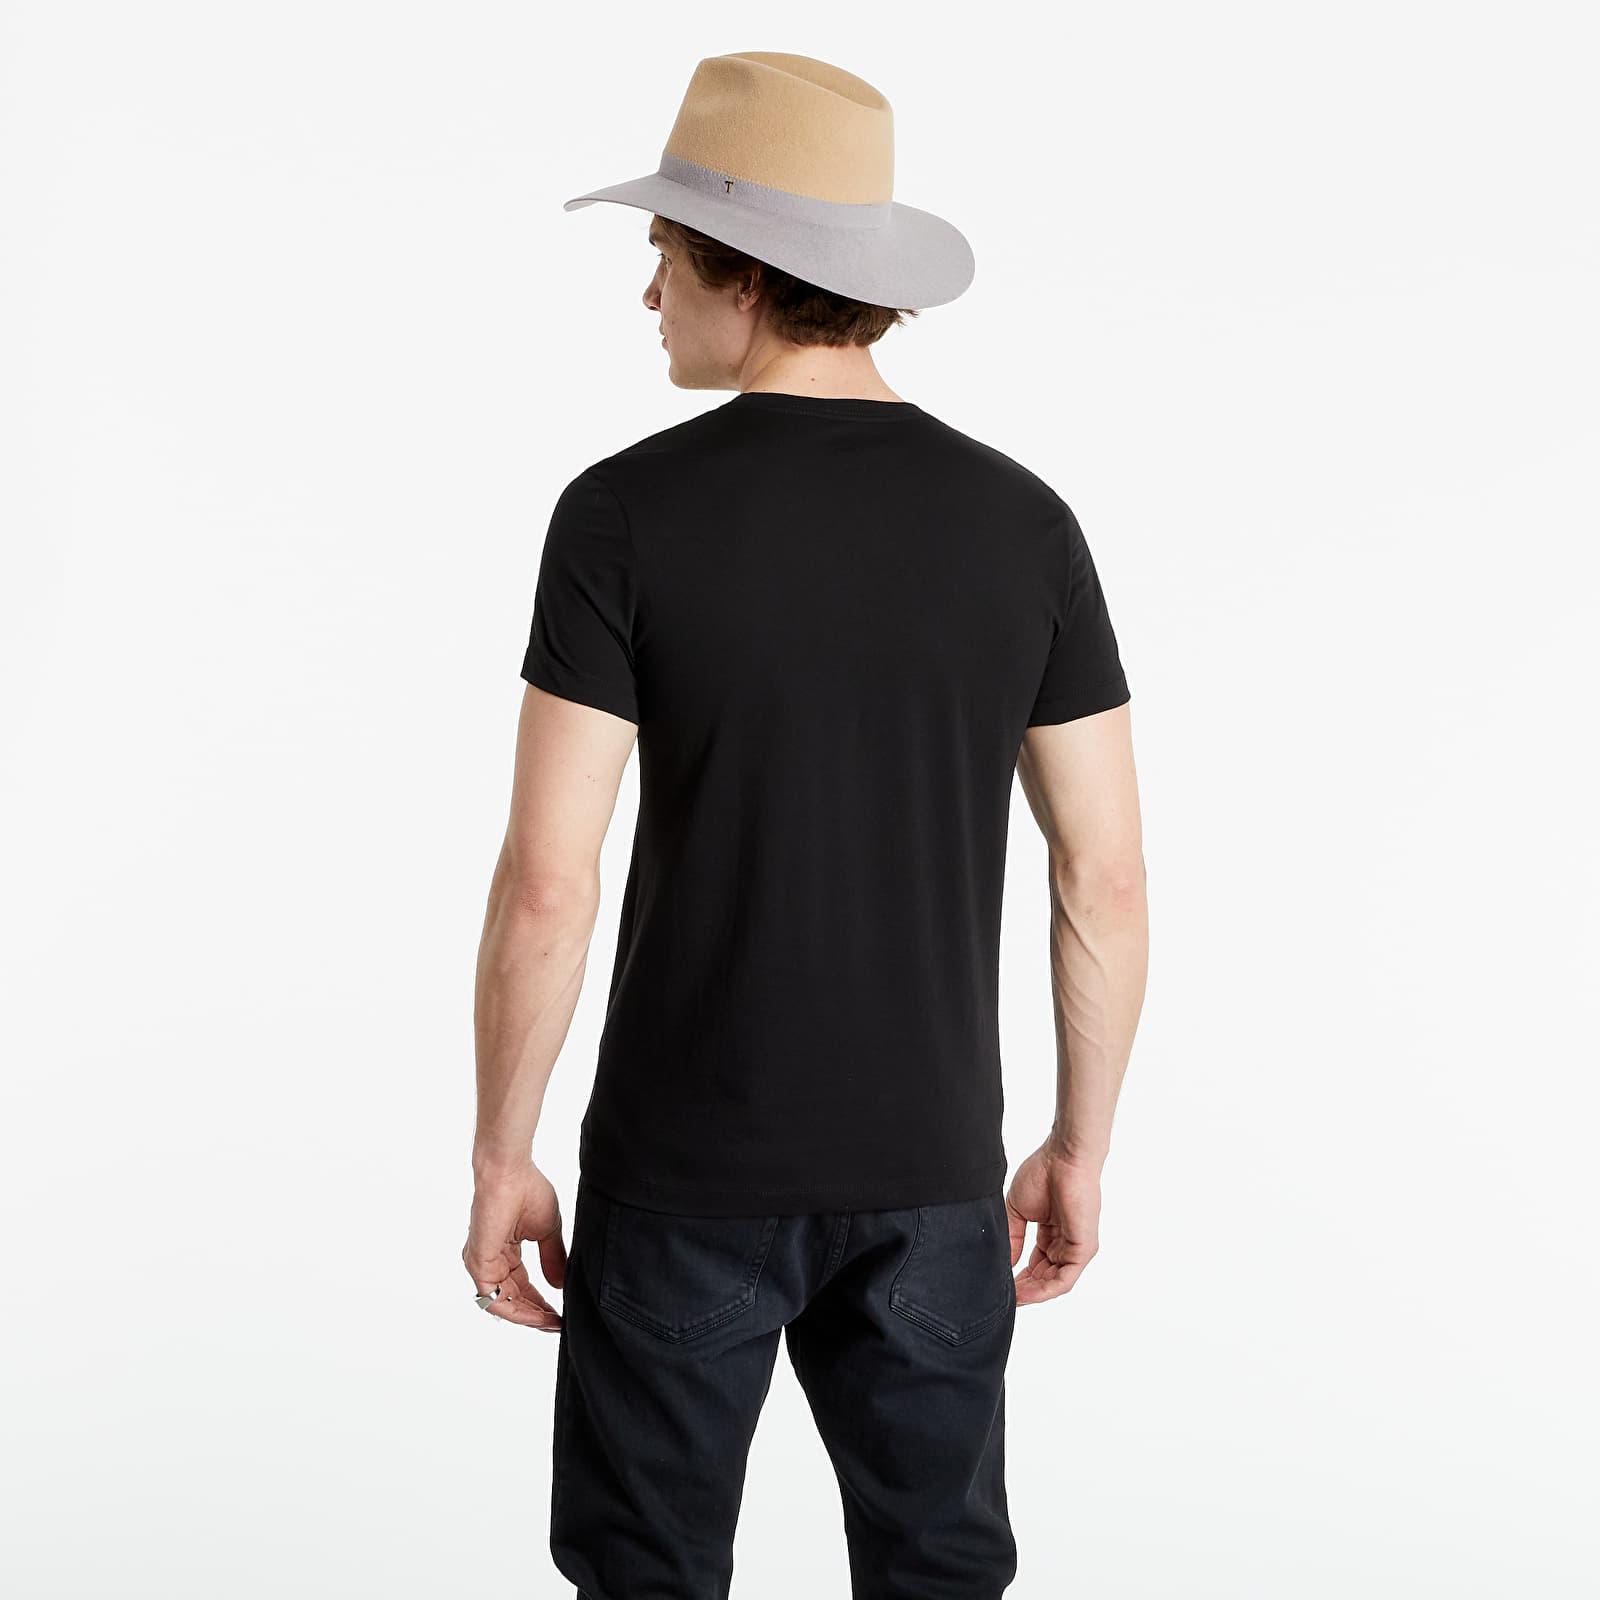 Calvin Klein Jeans 2 Pack Slim Organic Cotton T-Shirts Bright White/ Black Beauty M